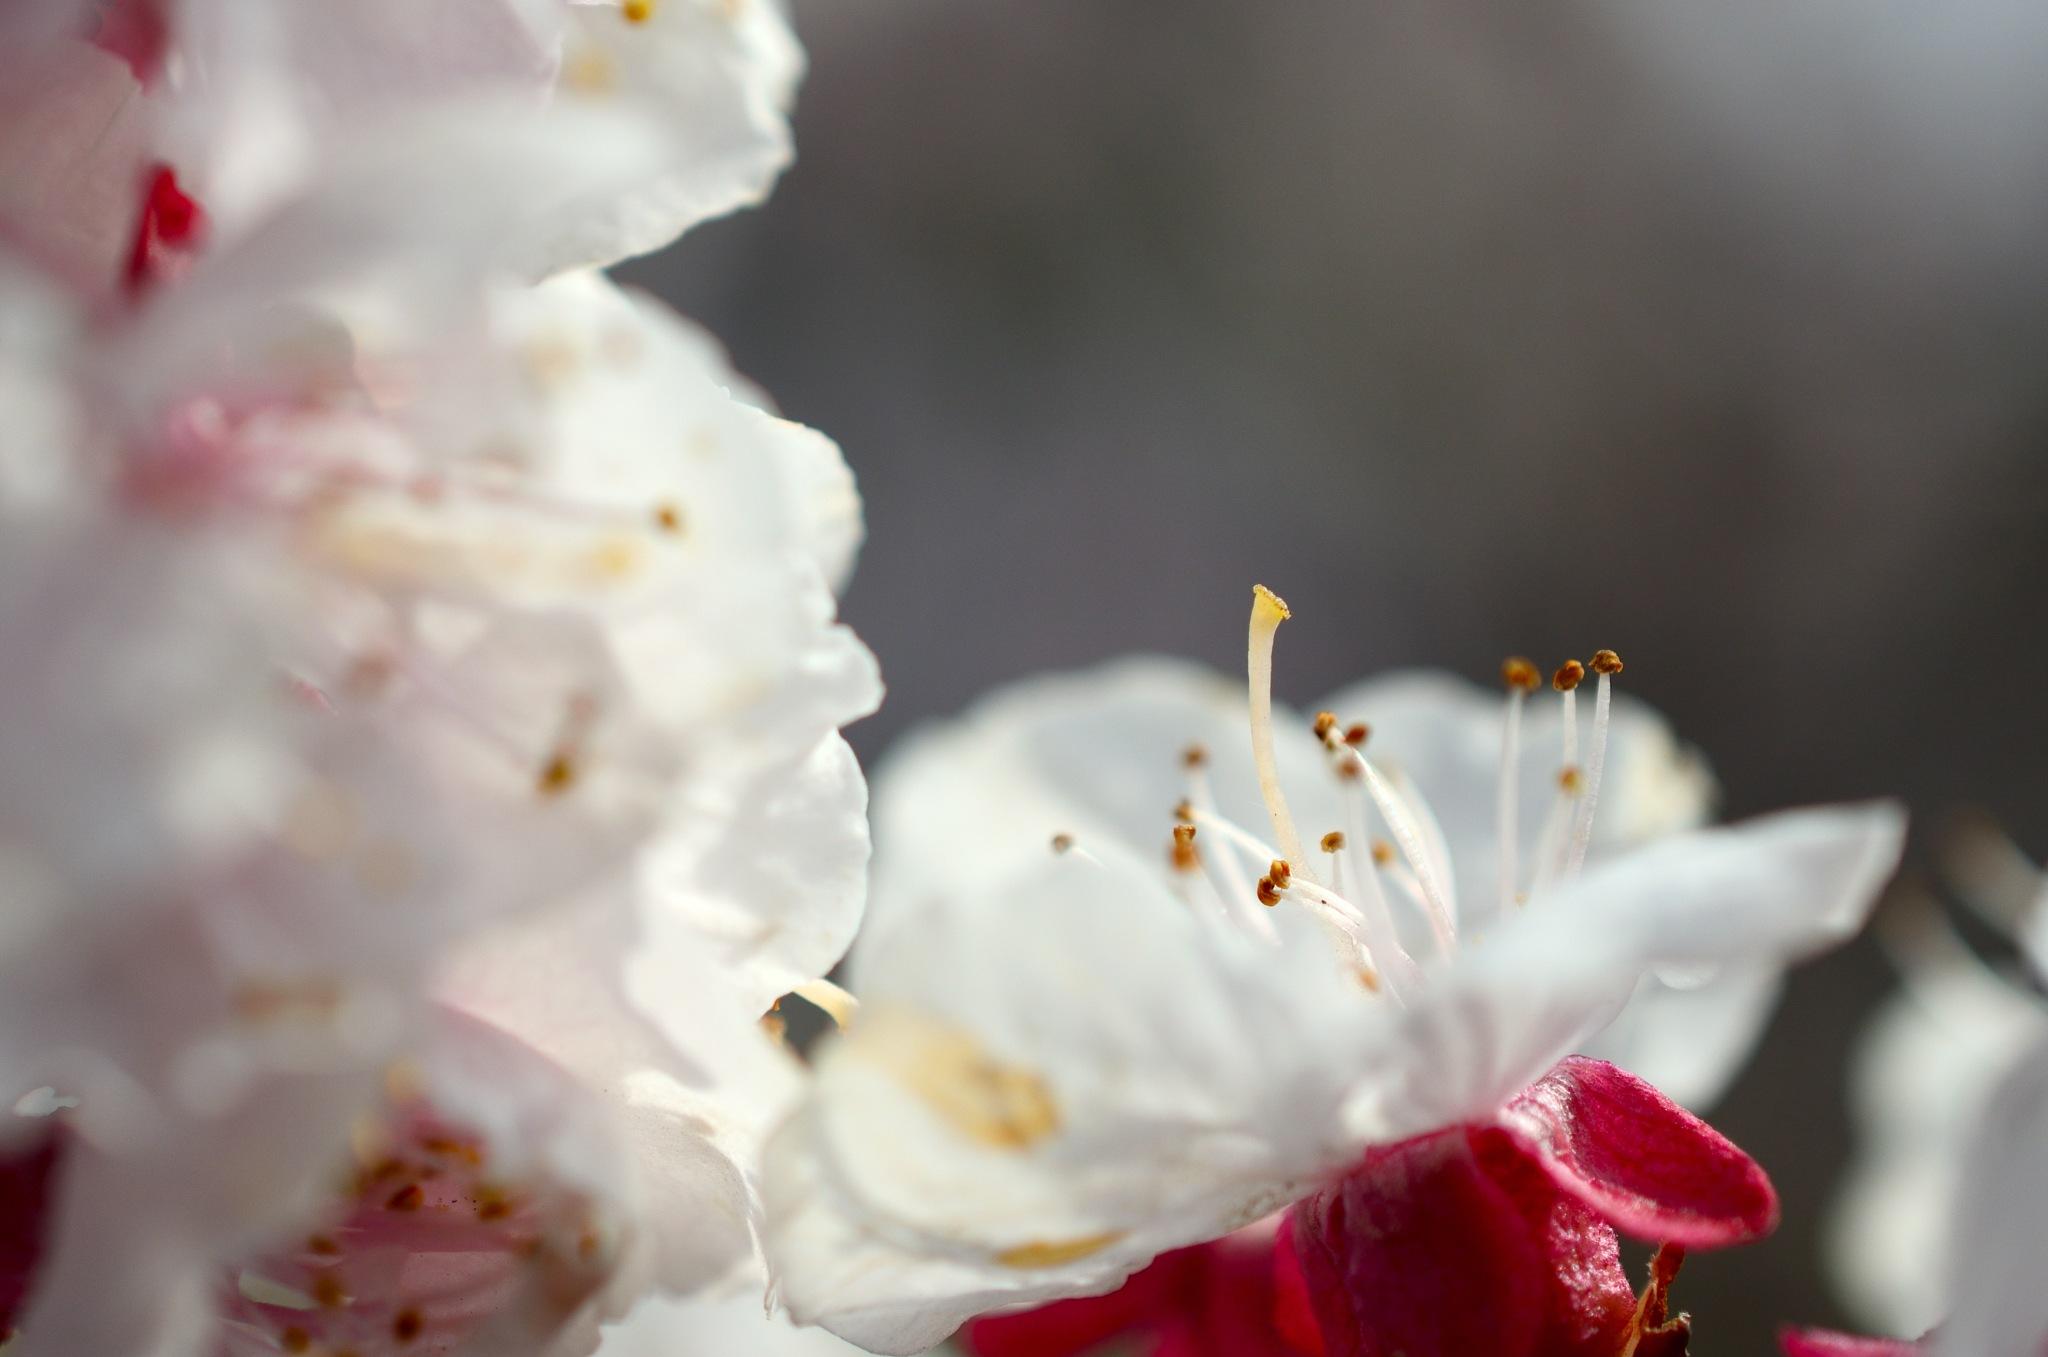 apricot by Masahiro  Asano